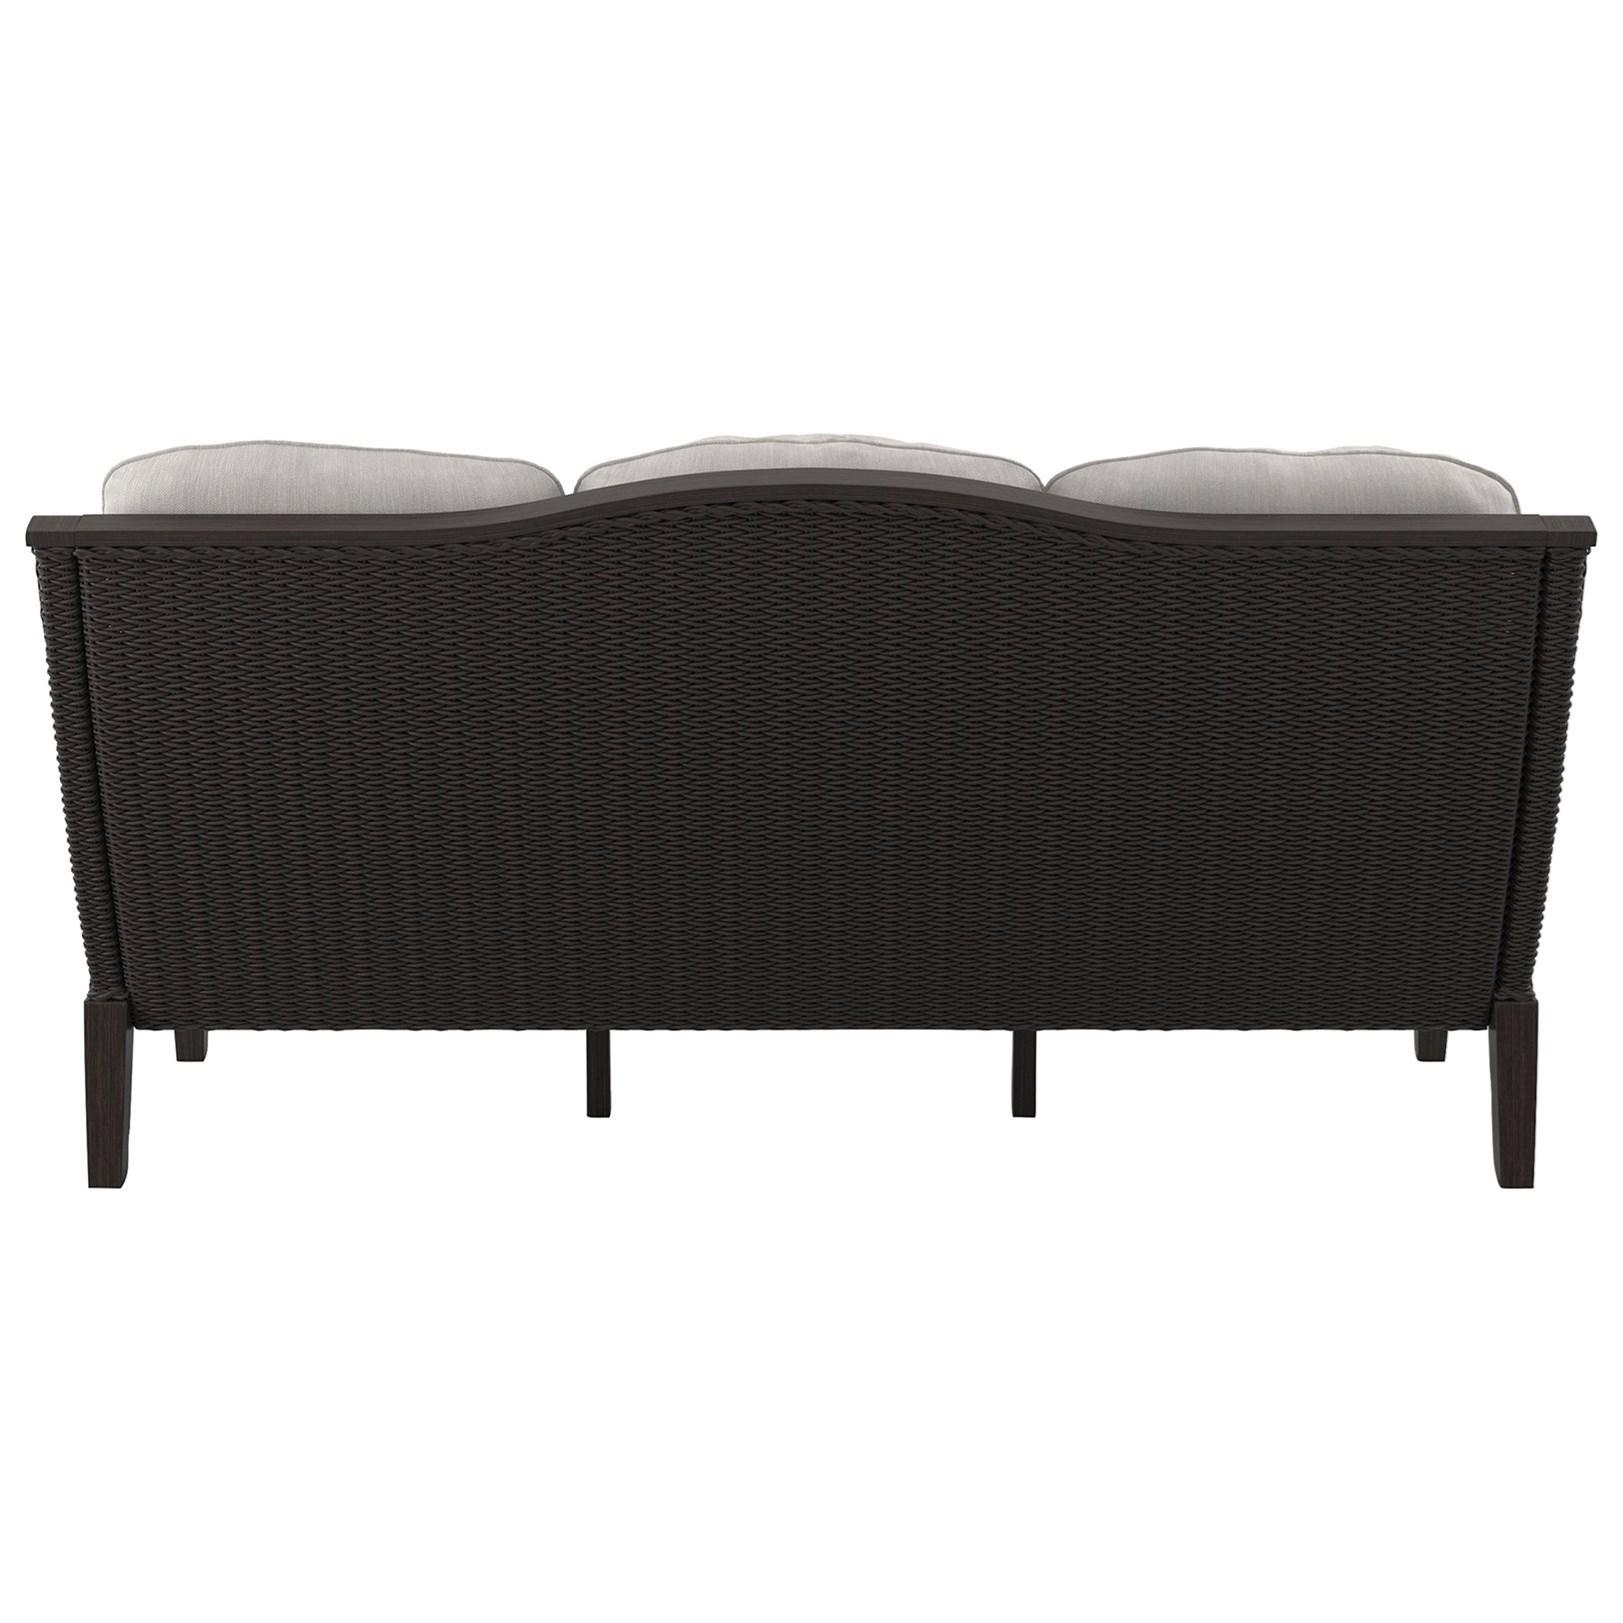 Ashley (Signature Design) Marsh Creek Outdoor Sofa With